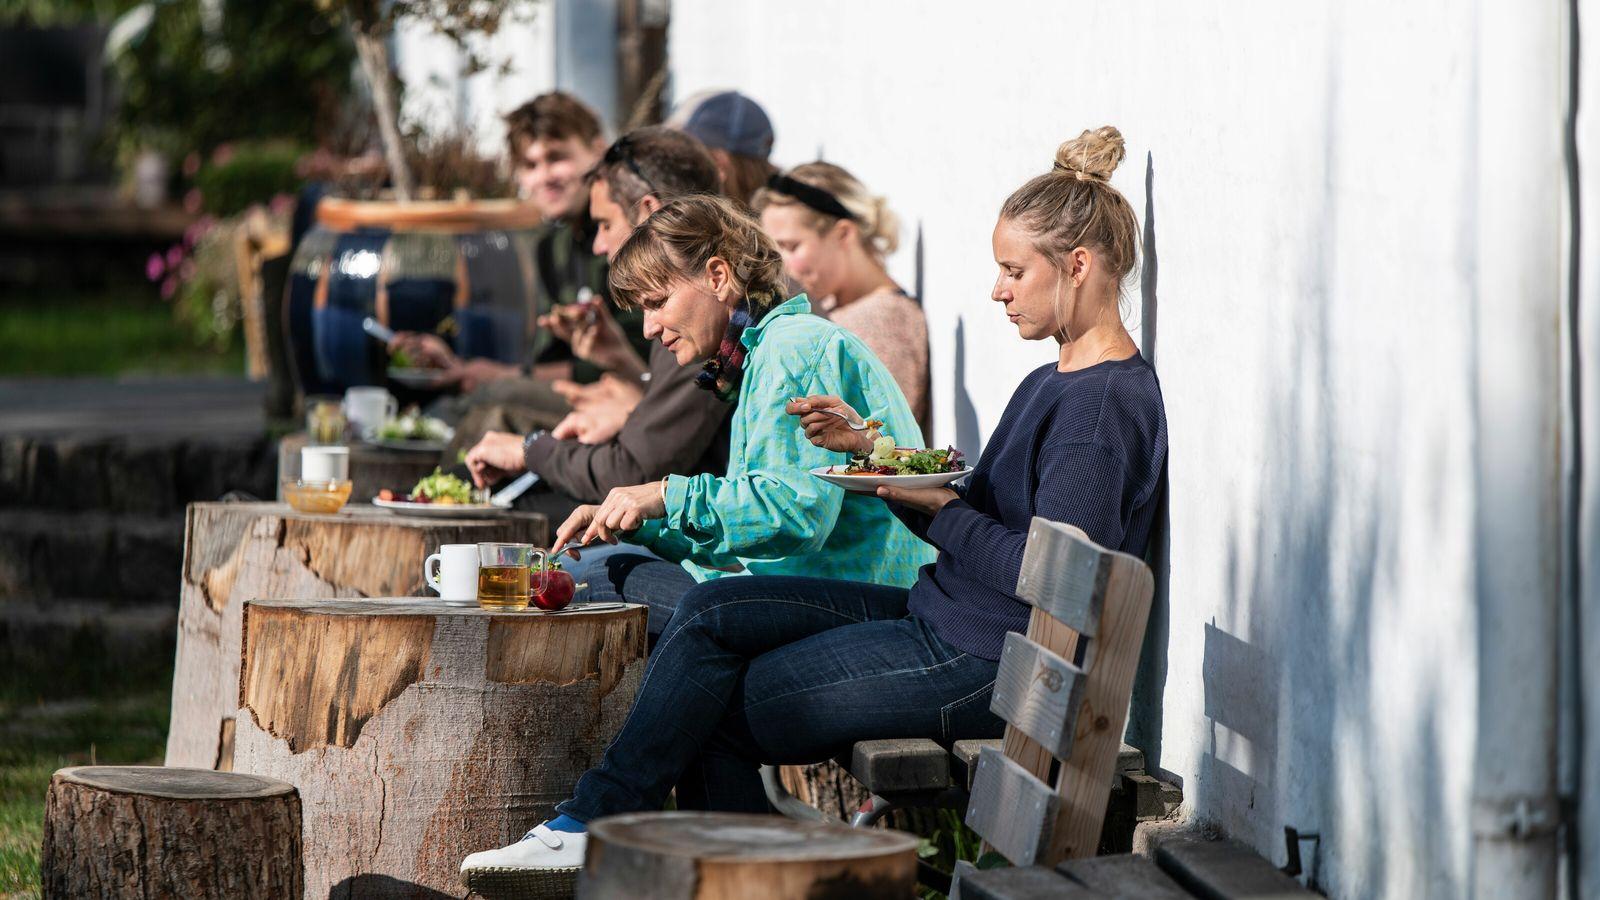 Residents of Svanholm, Denmark's largest commune, sharing lunch in the sunshine.